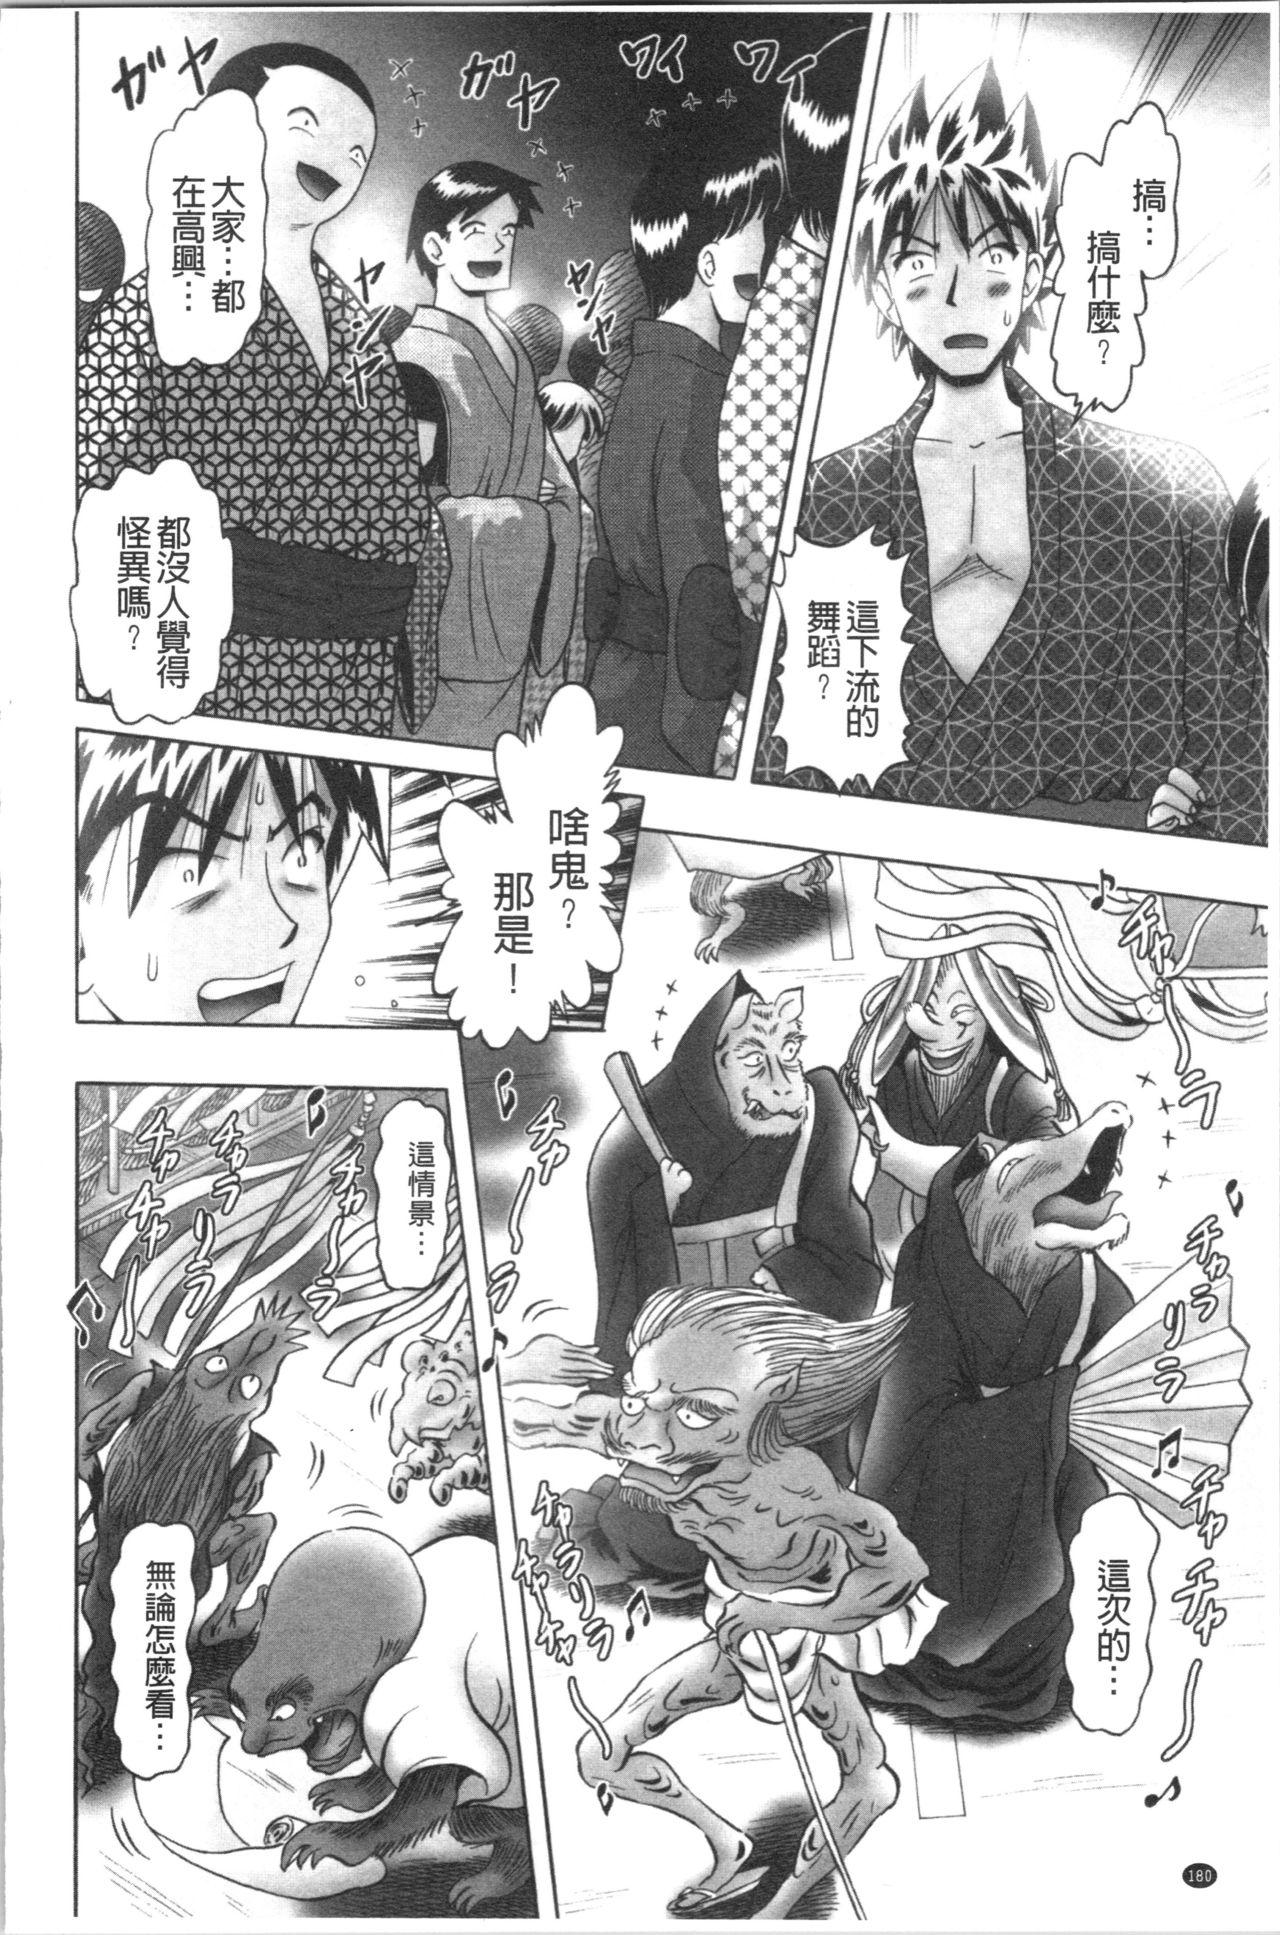 Yousei Settai - Aiyoku no Yukemuri Ryojou | 幼性接待 愛欲的溫泉湯煙旅情 181